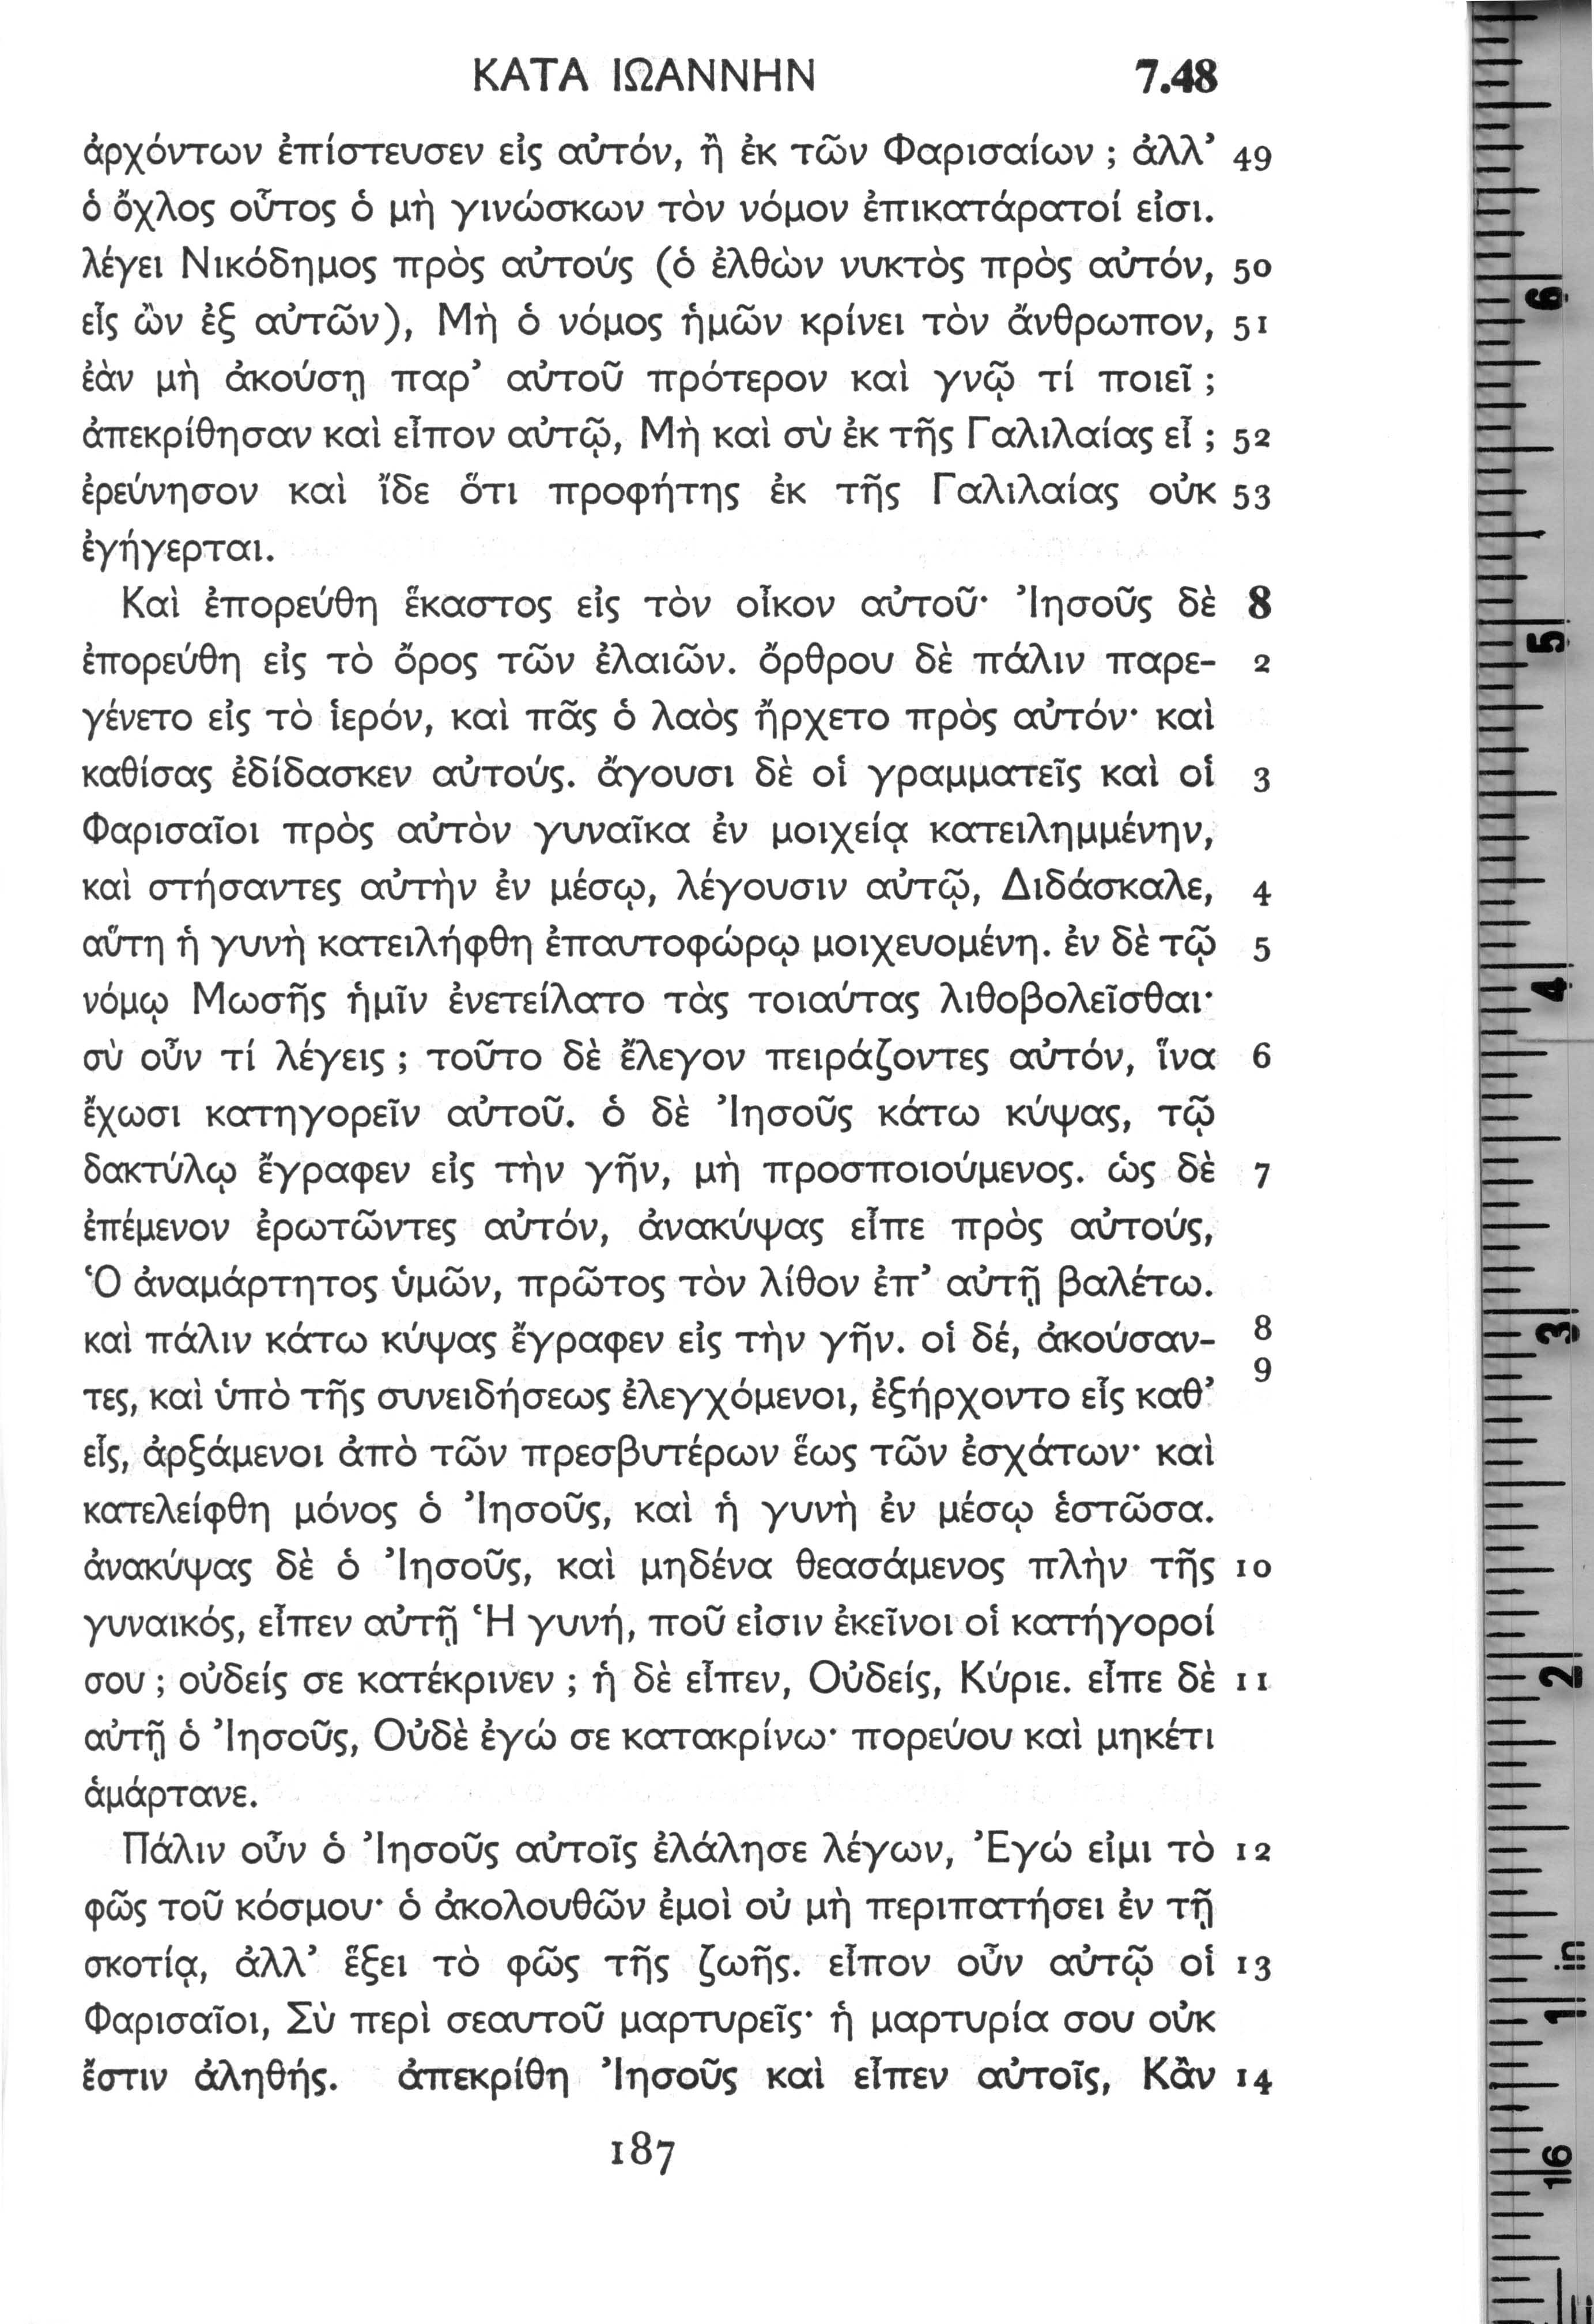 wl greek times ancient font download